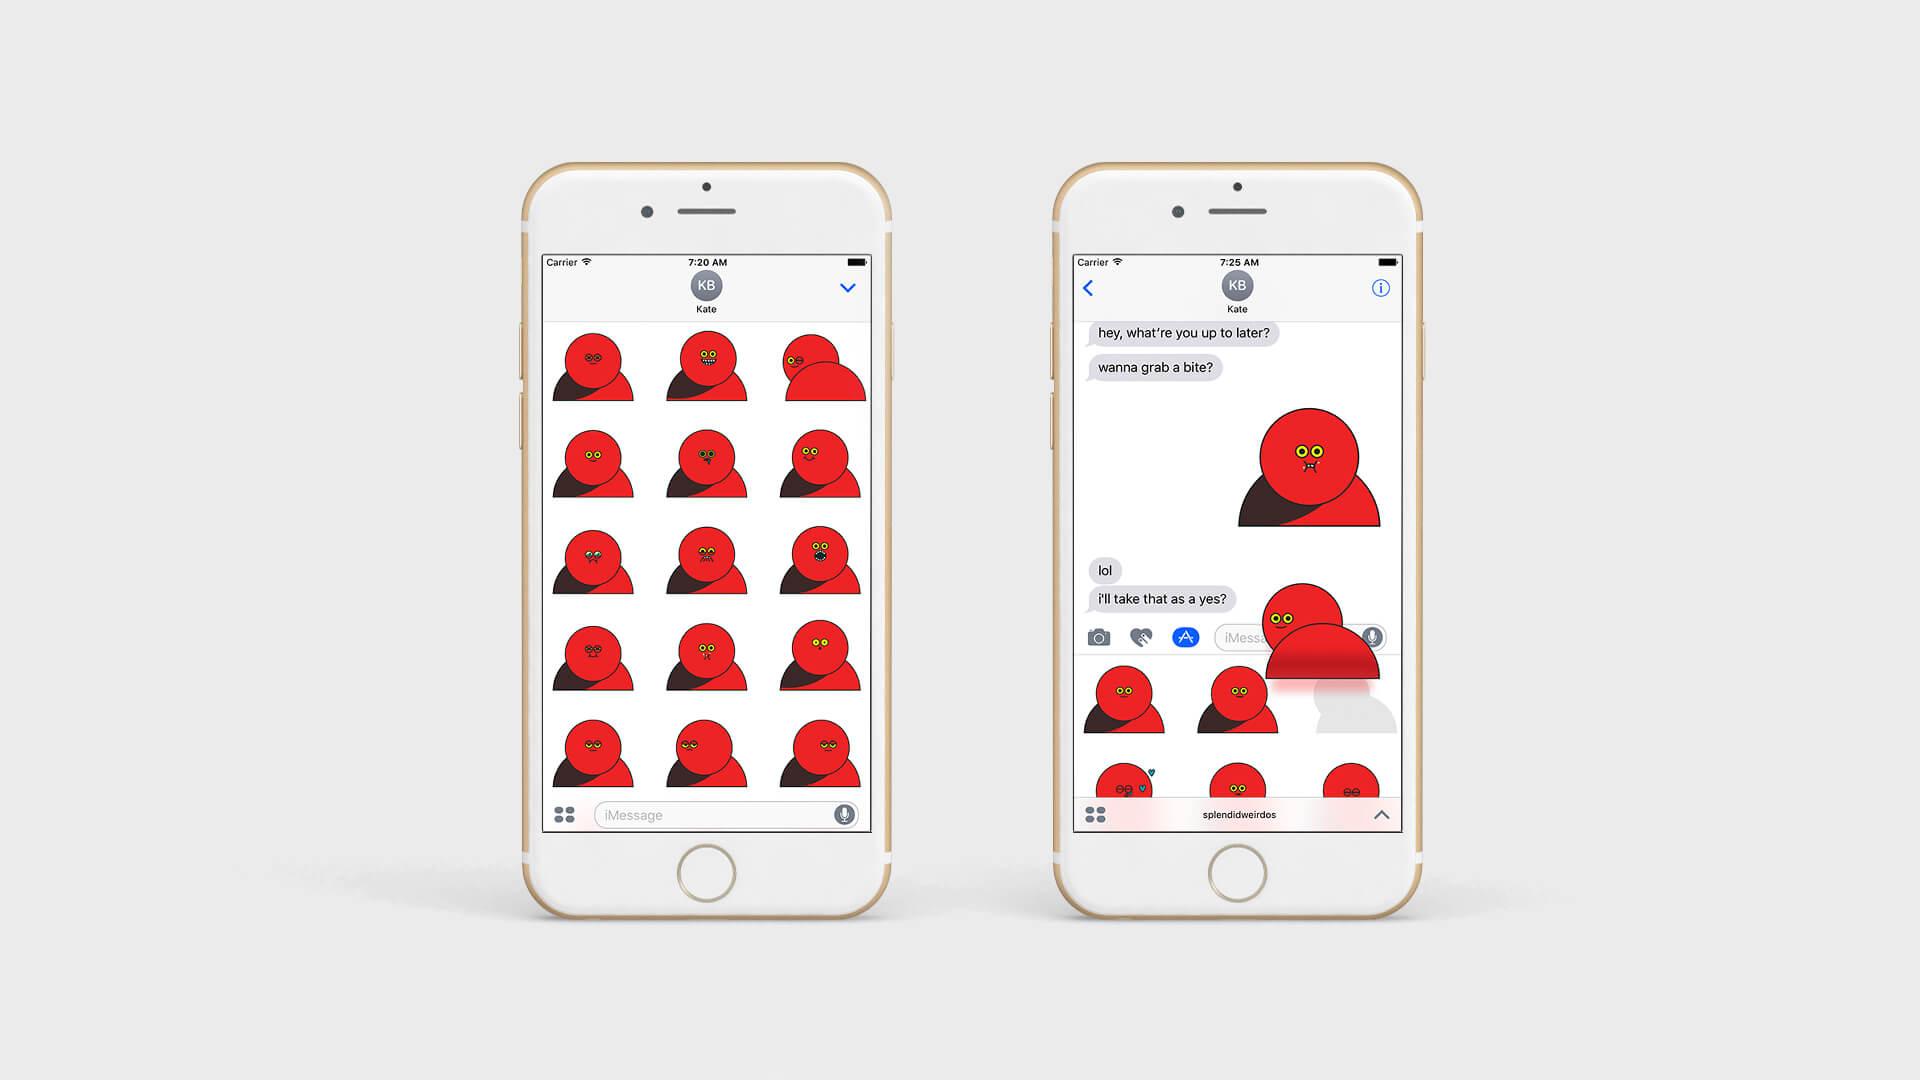 Splendid Weirdos Apple iPhone iOS messages animated sticker pack